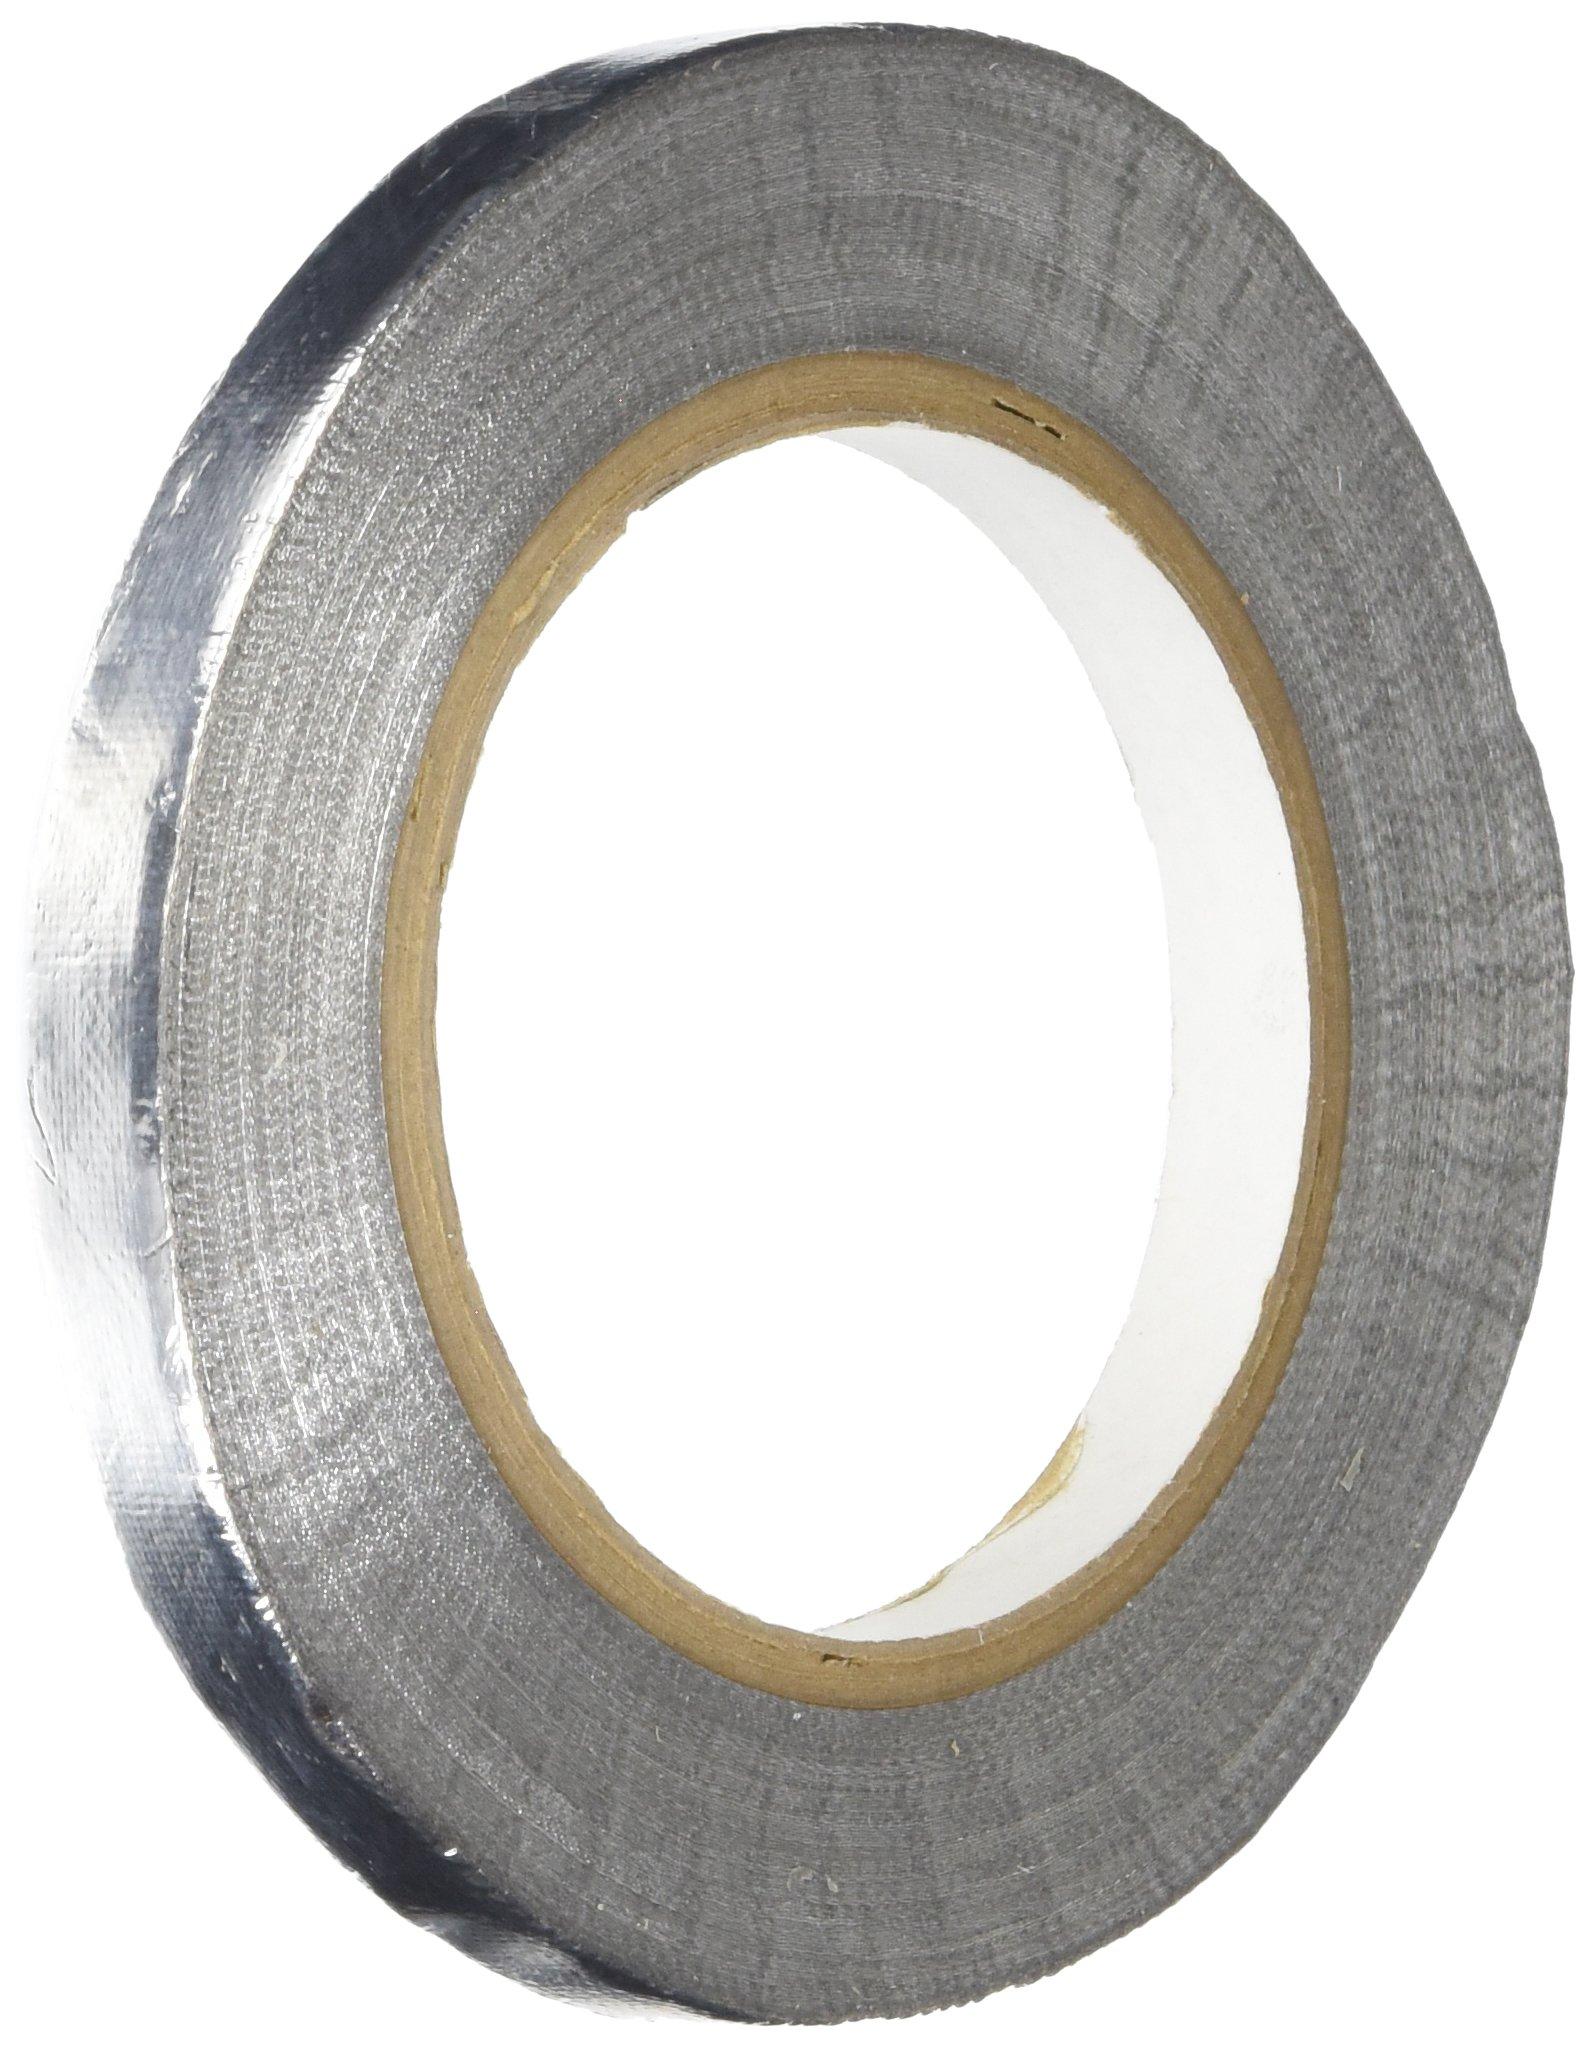 TapeCase TC955 Glass Cloth Aluminum Foil Tape 1/2'' x 36yds (1 Roll)